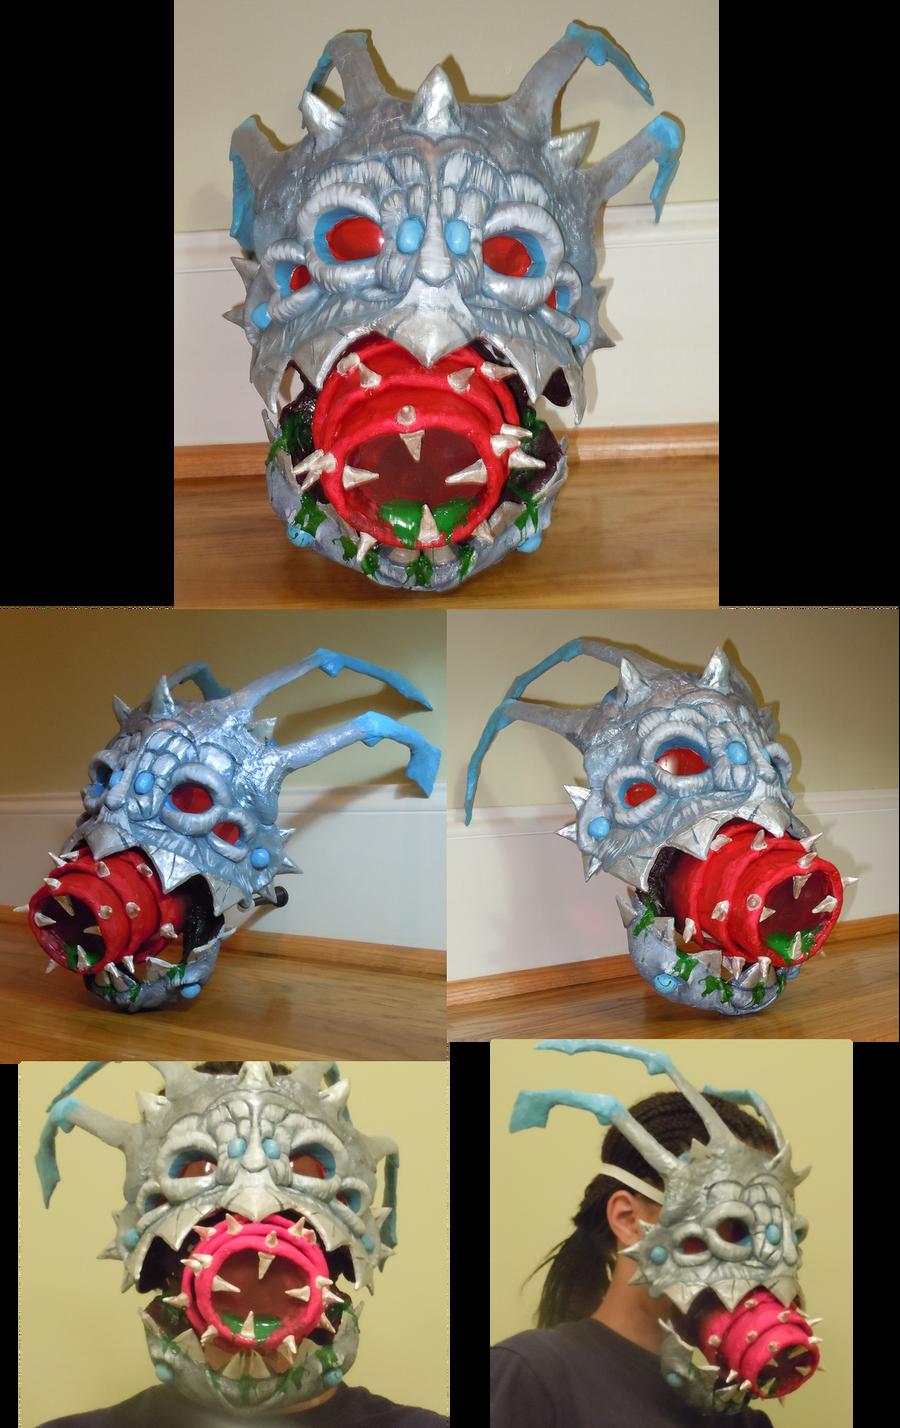 Kog maw Mask - New Year s Tiger Head Mask